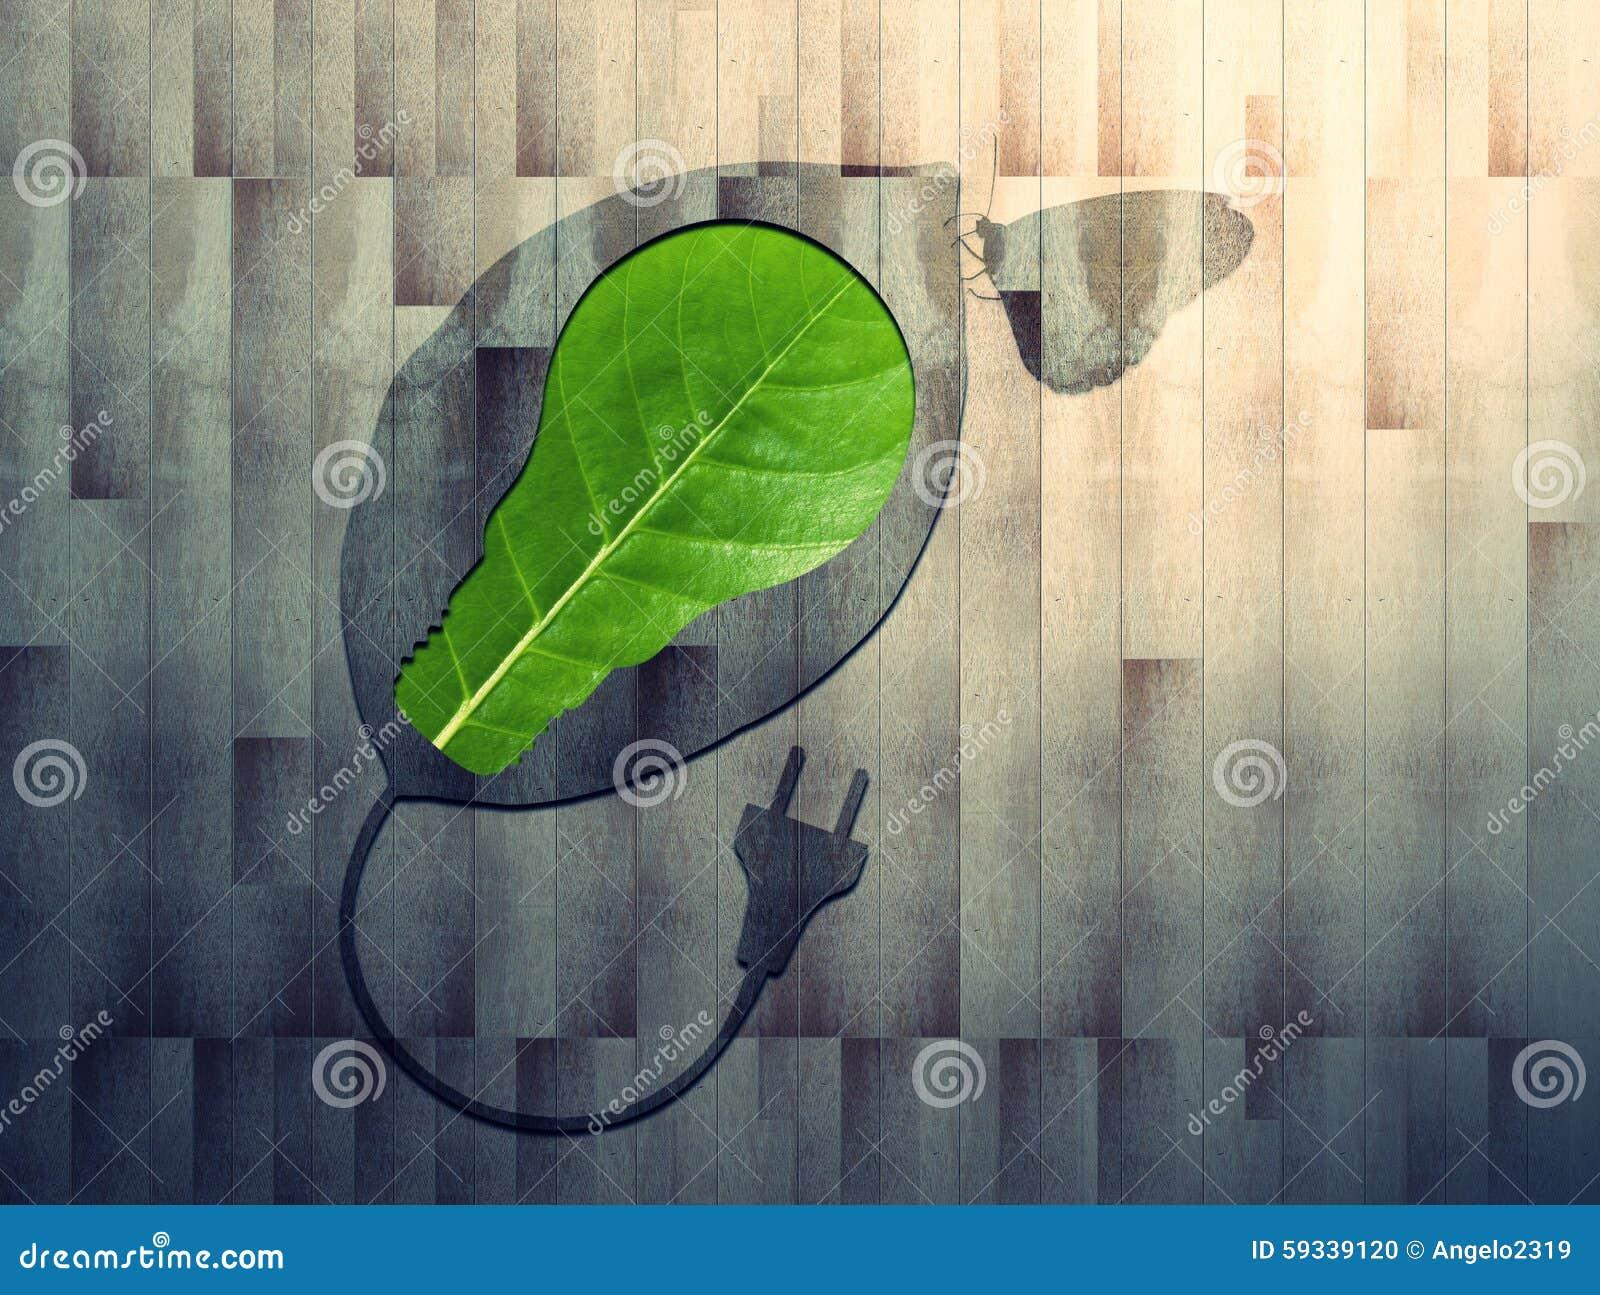 Eco on board